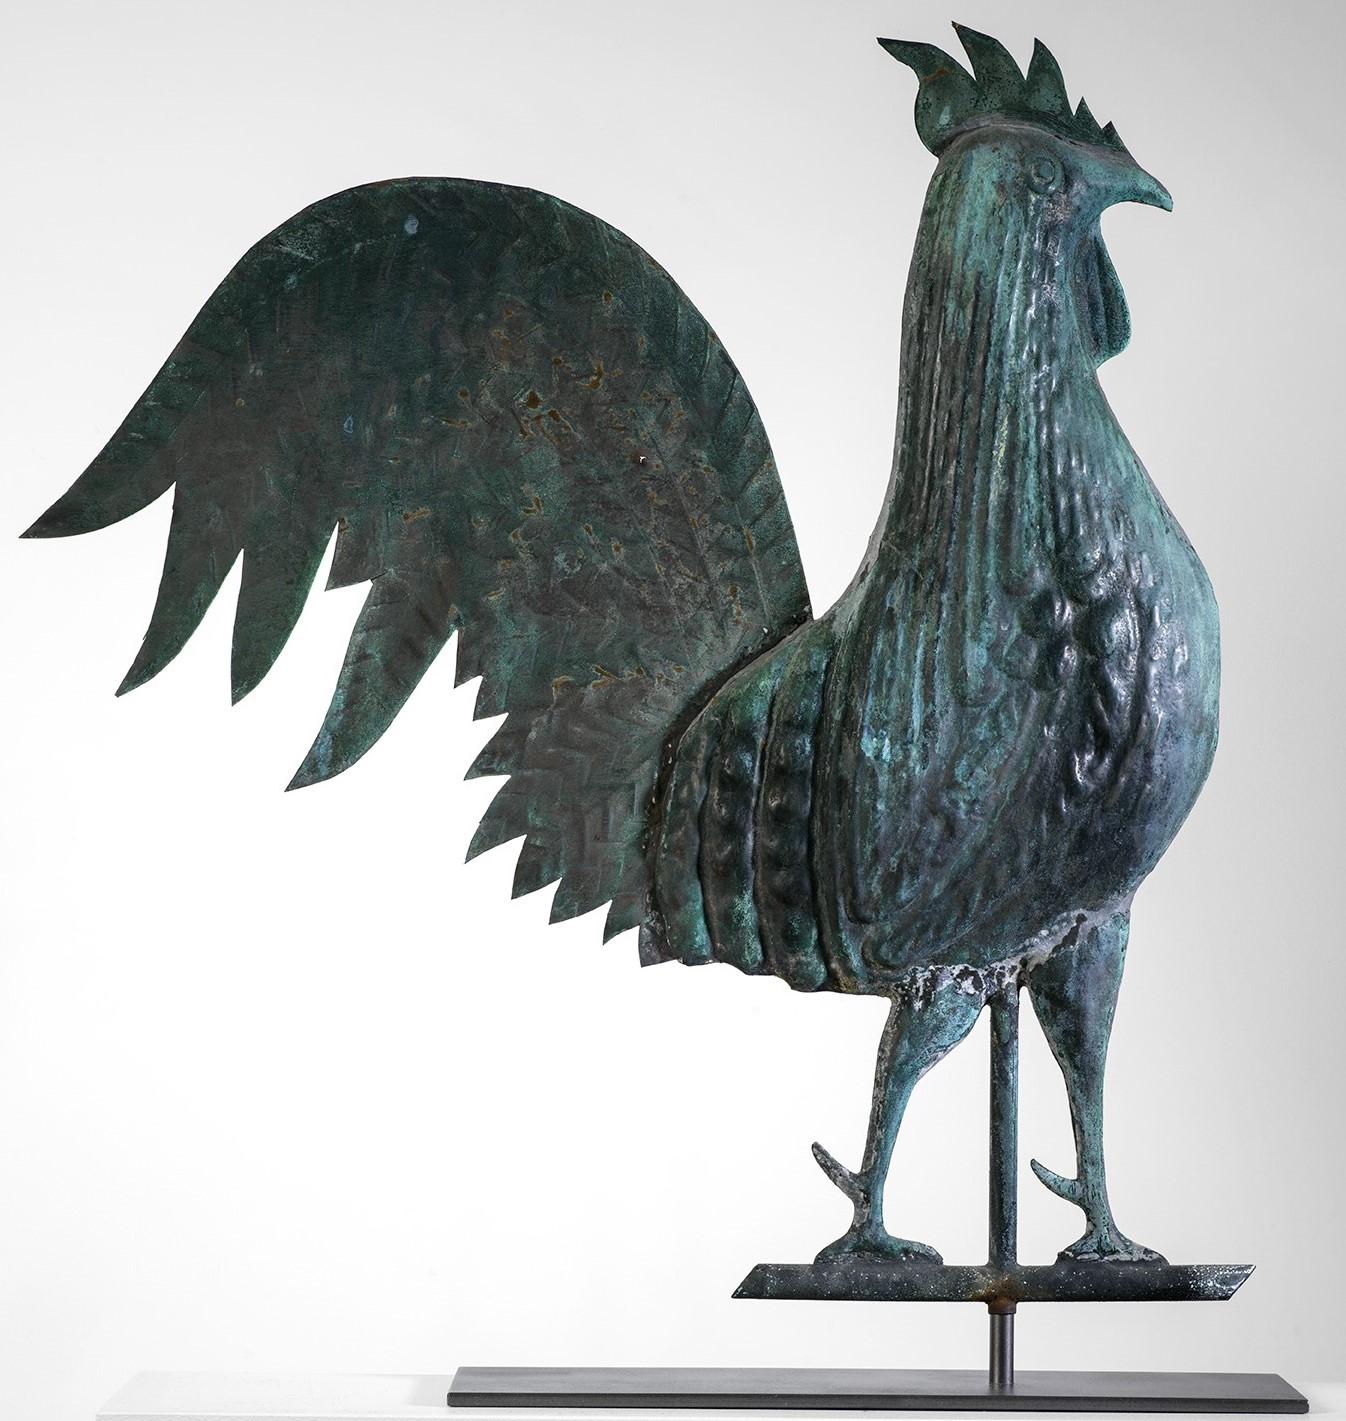 antique copper rooster weathervane rel=